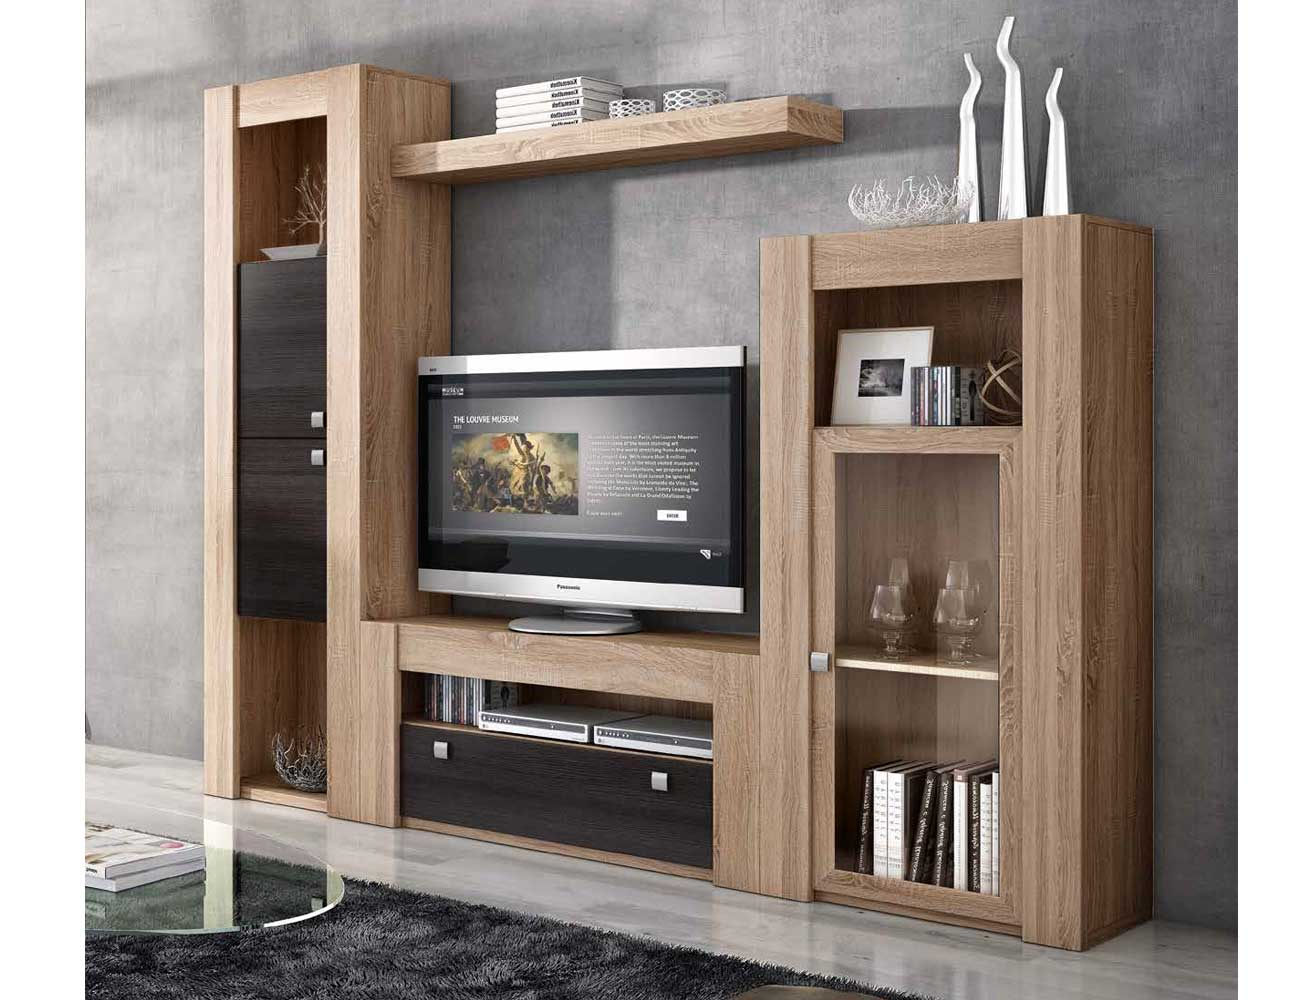 Mueble salon moderno comp04a1